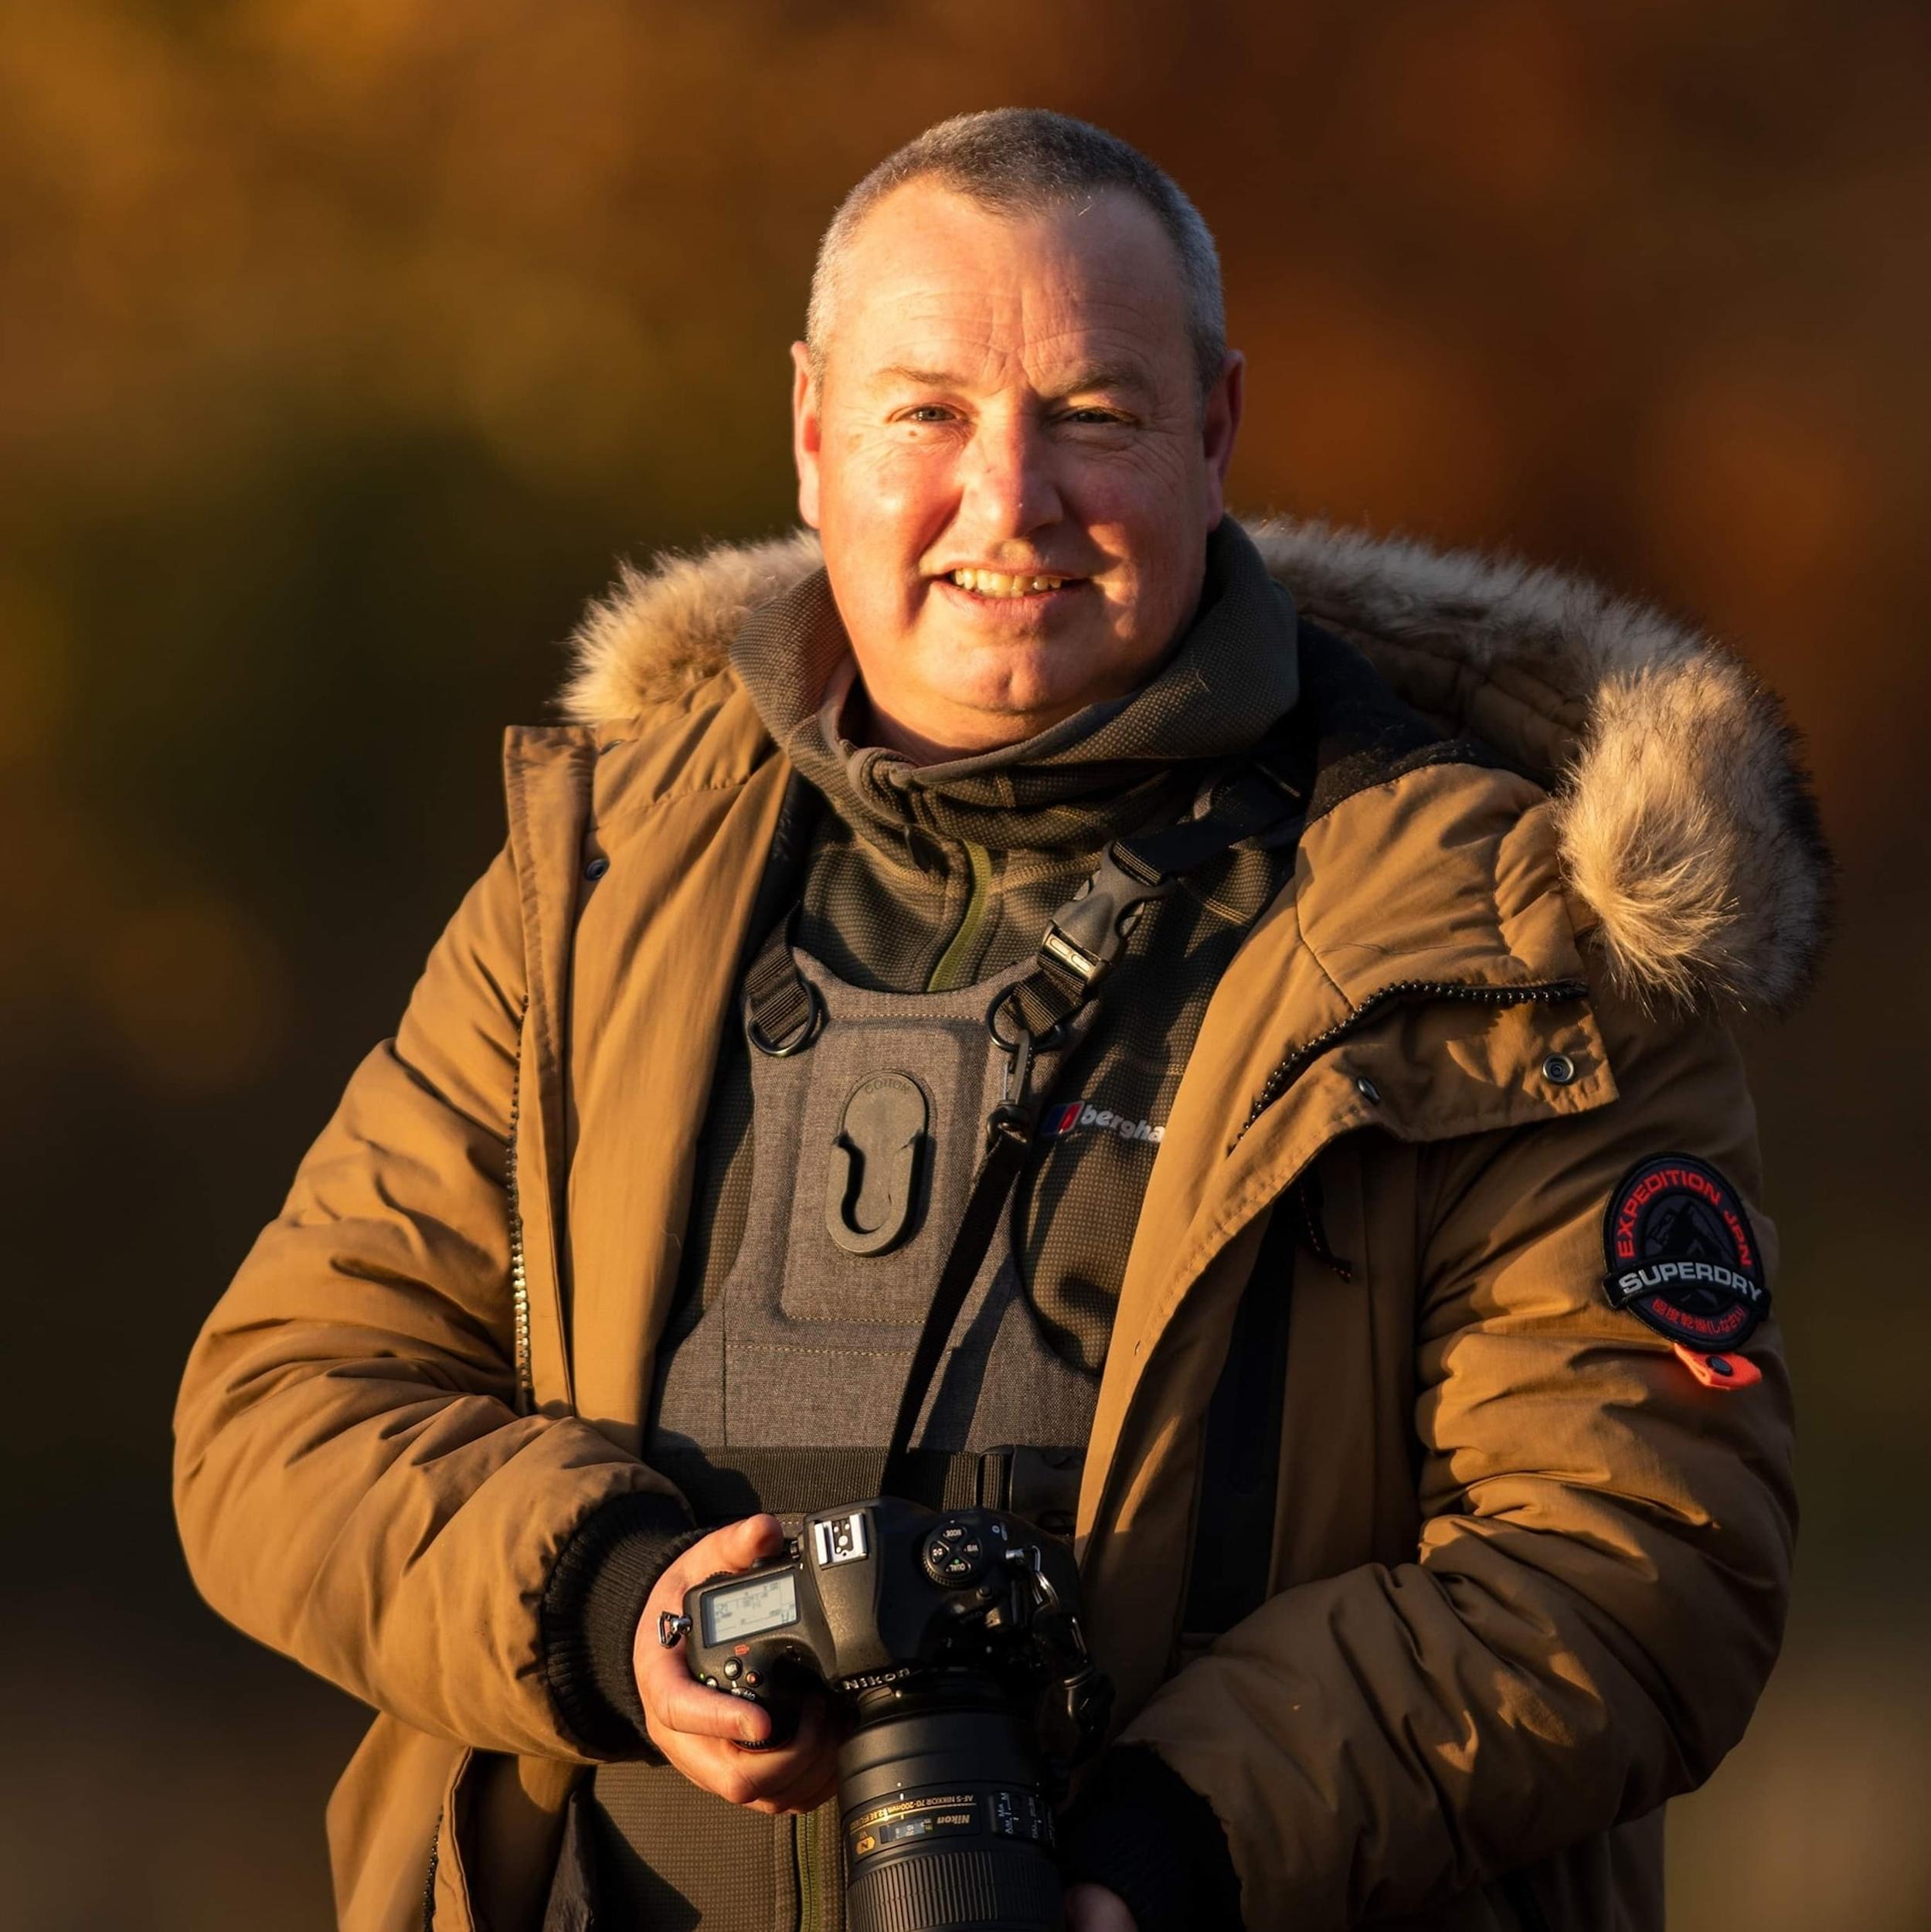 Derek McSwan - Kingfisher photographer